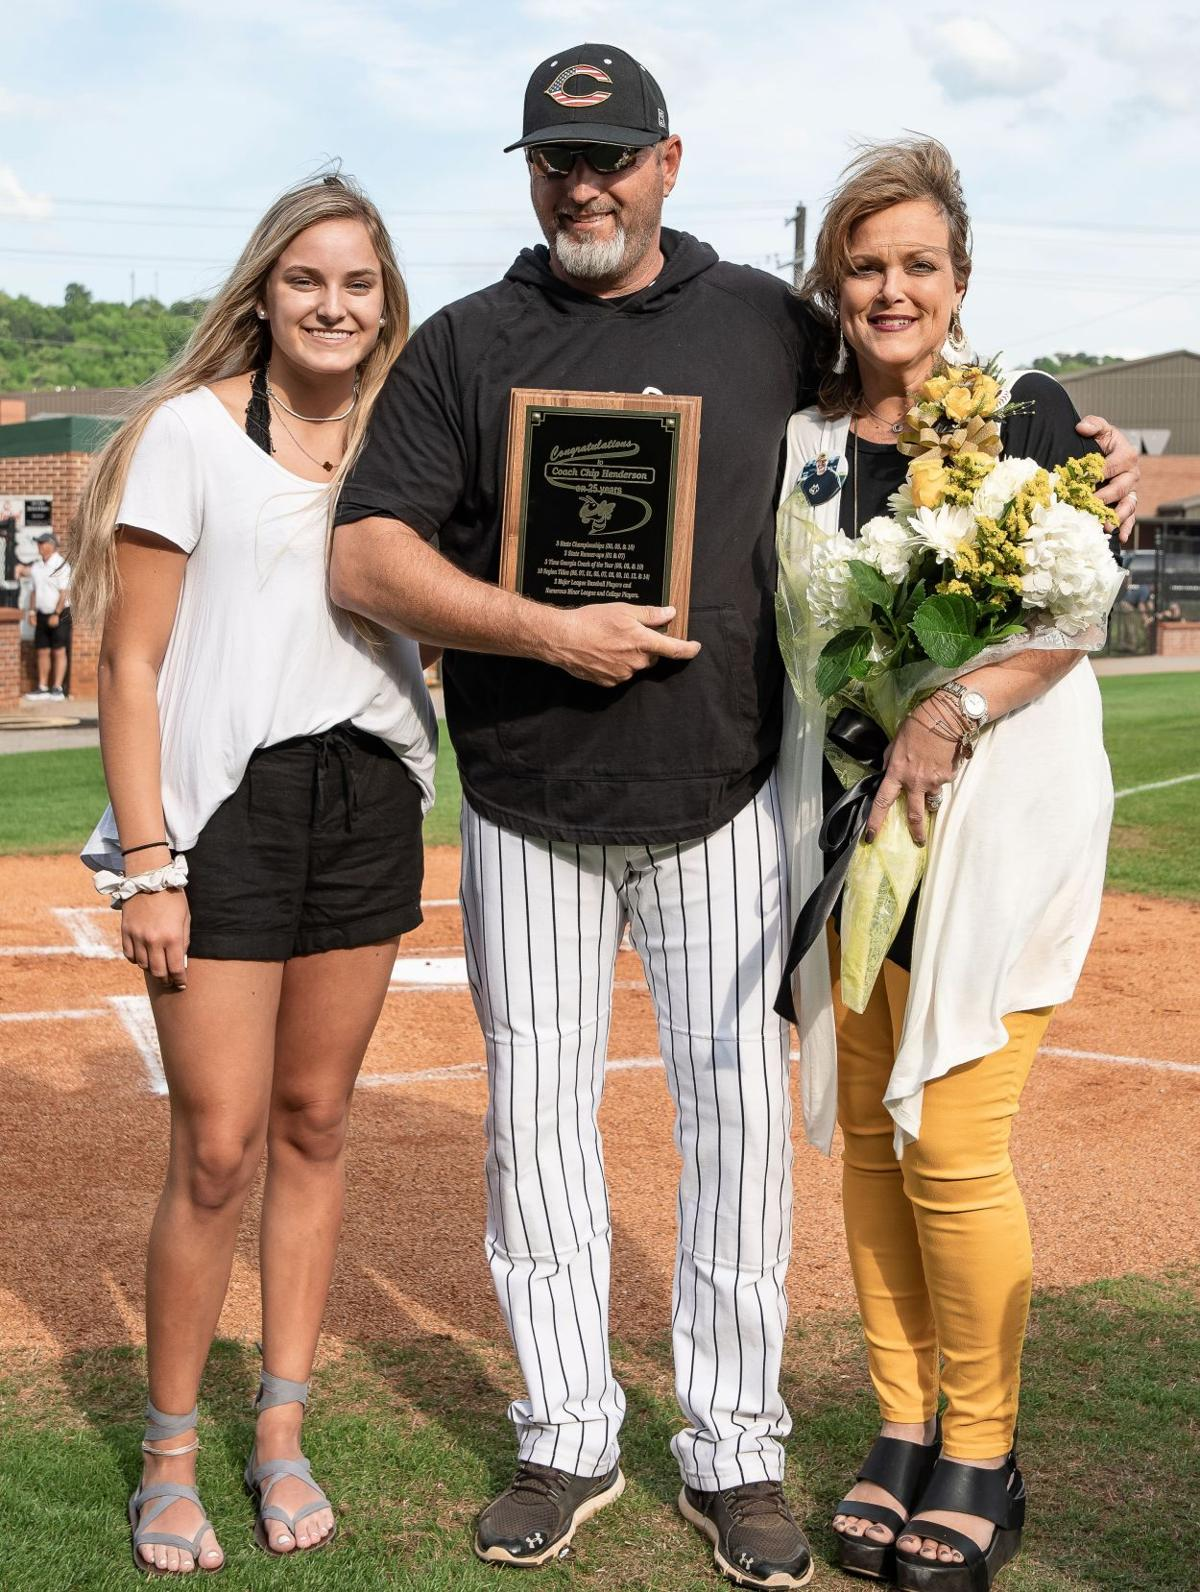 Calhoun Baseball honors seniors, staff member and coach Henderson